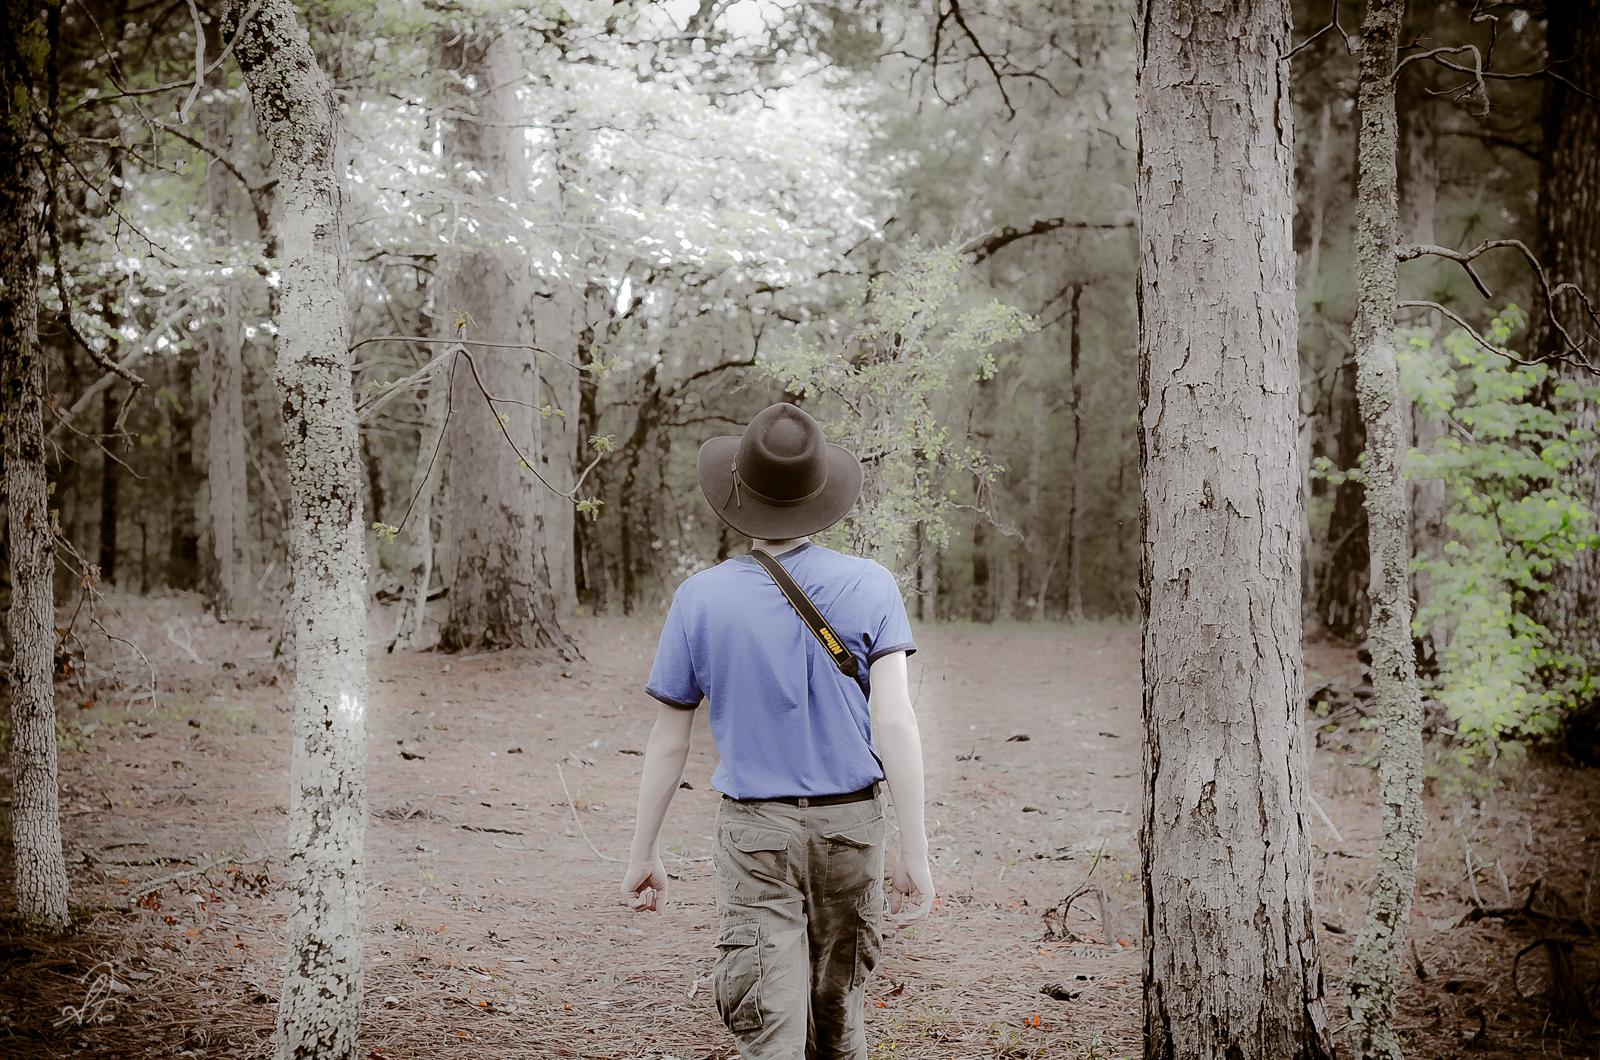 Photowalk in the Woods